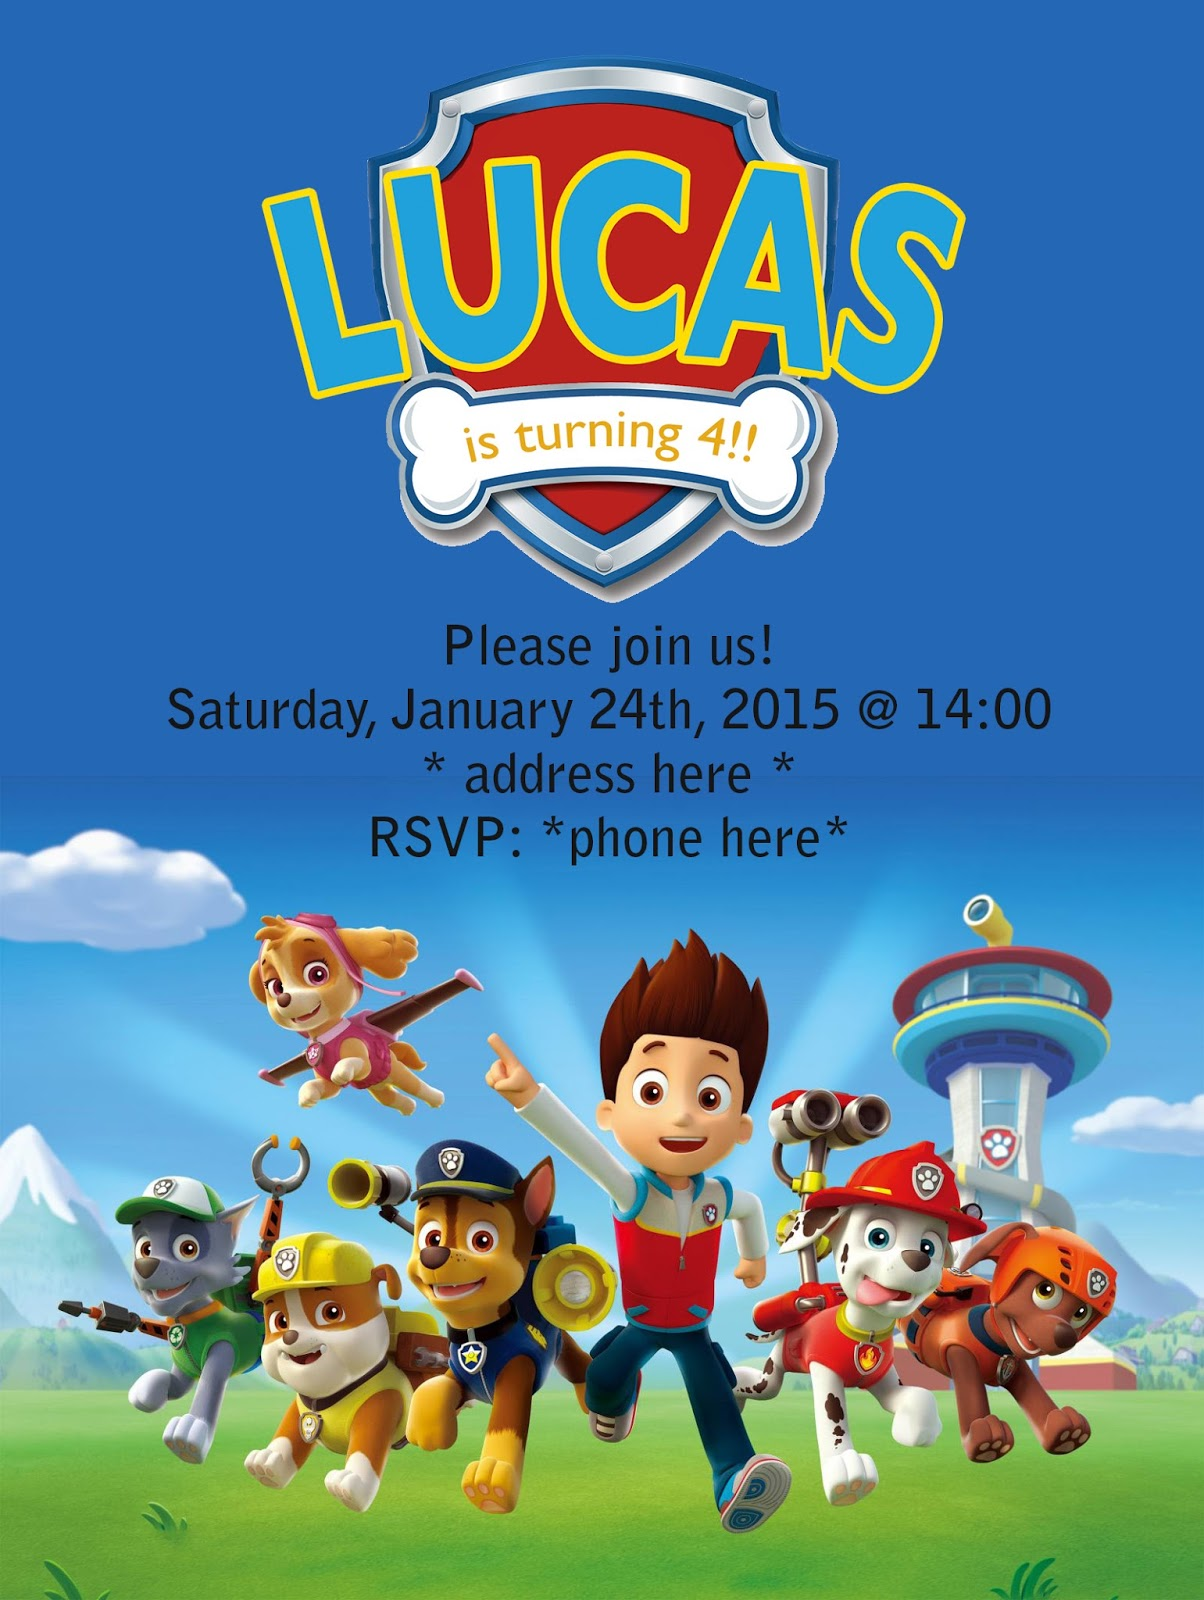 Lucas Paw Patrol 4th Birthday Party